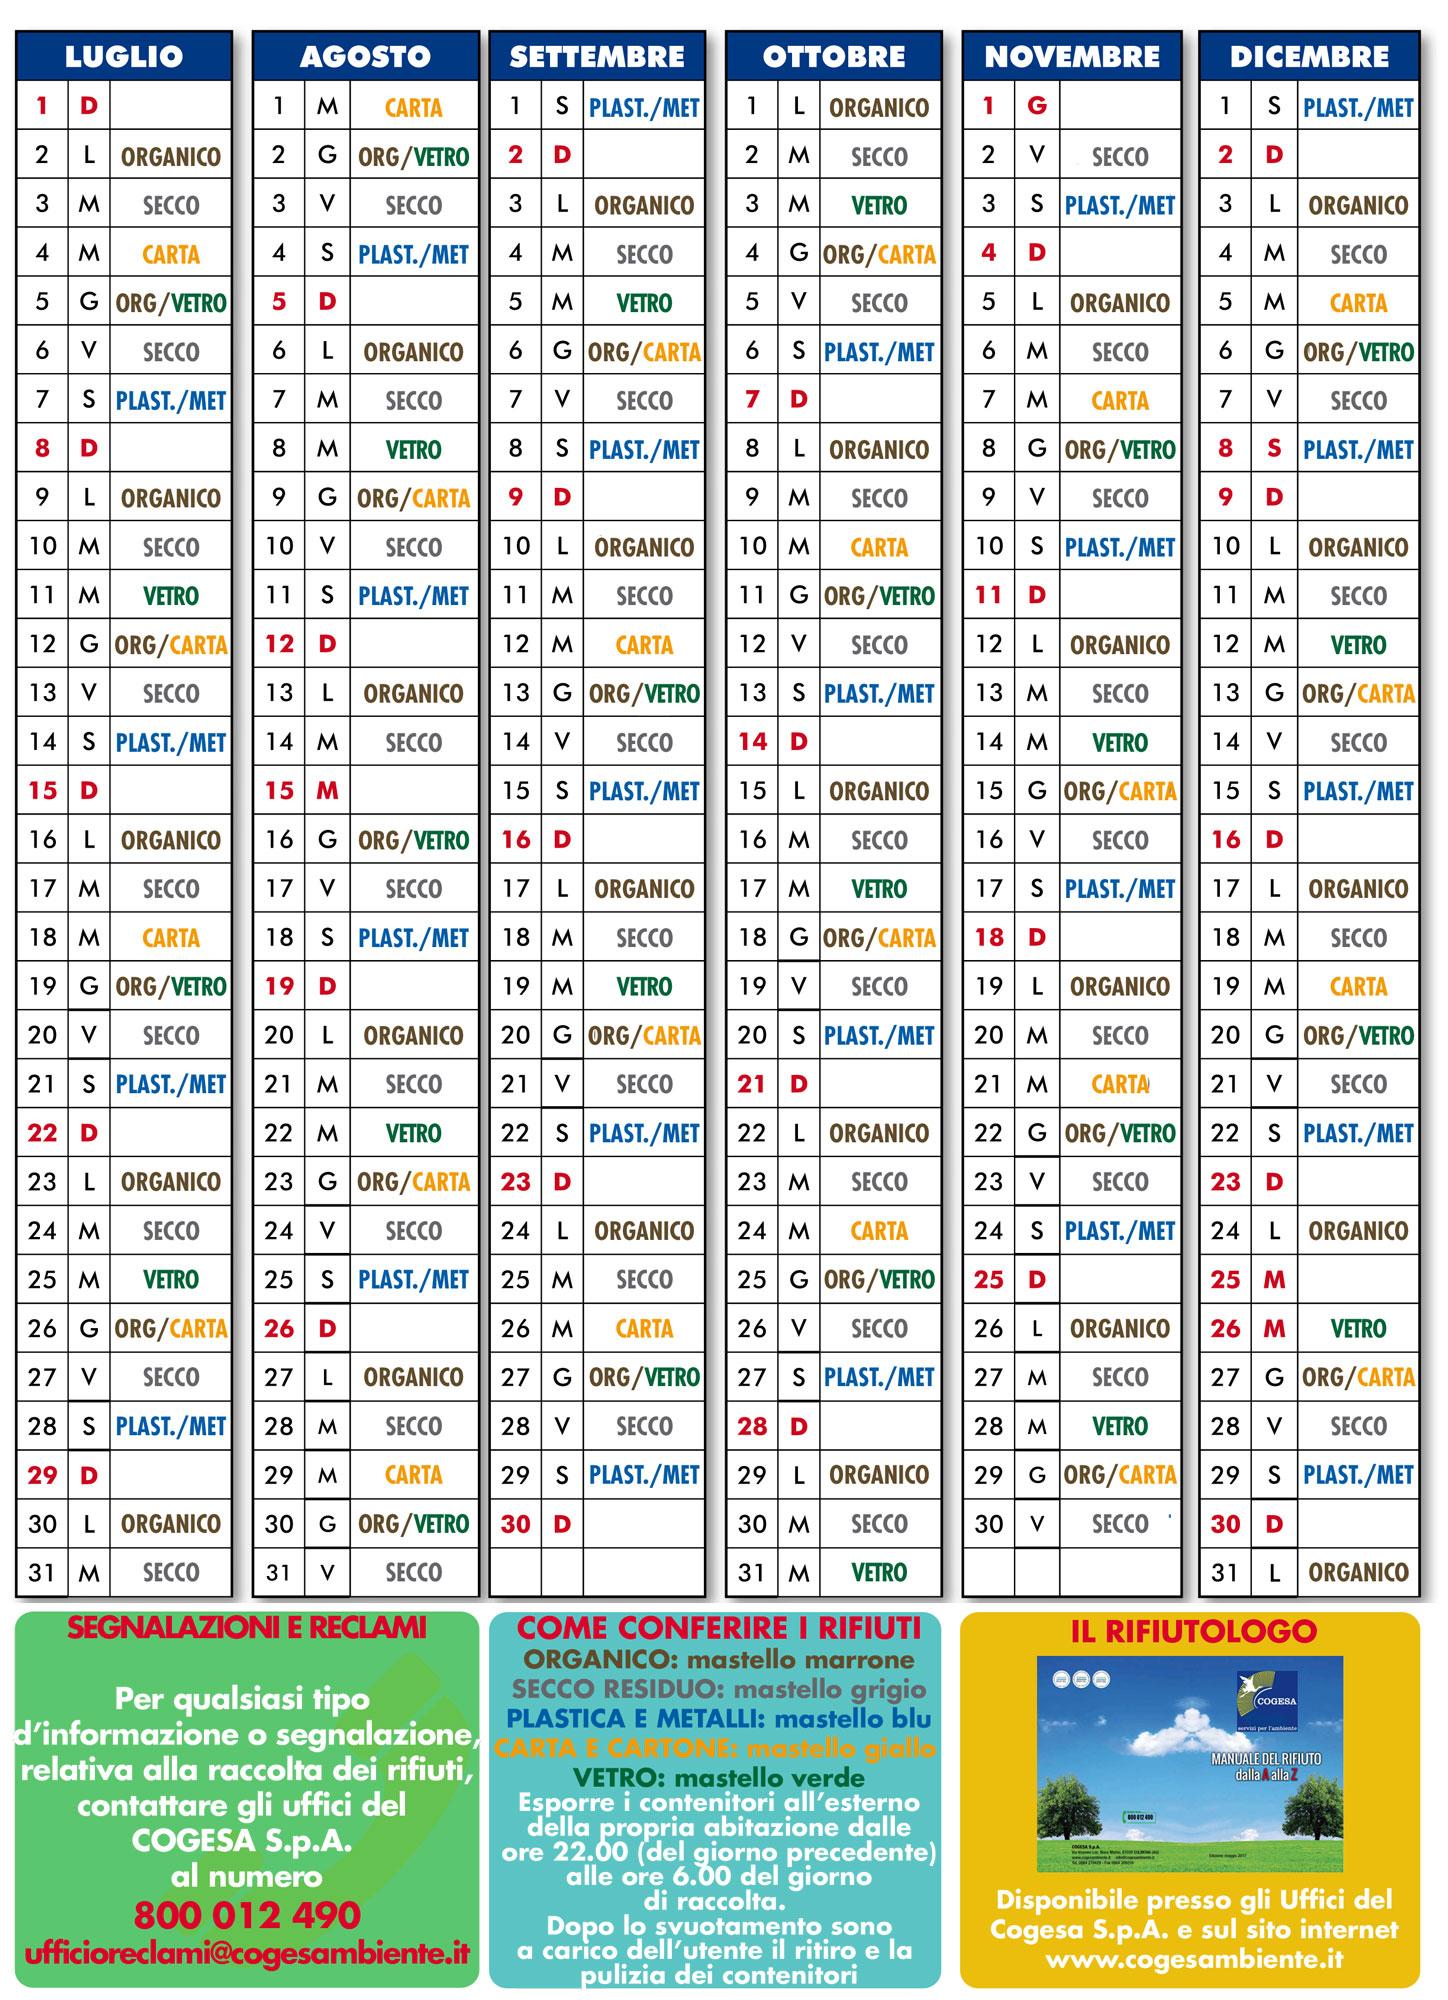 Raccolta Differenziata Siracusa Calendario 2019.Raccolta Differenziata Dei Rifiuti Calendario 2018